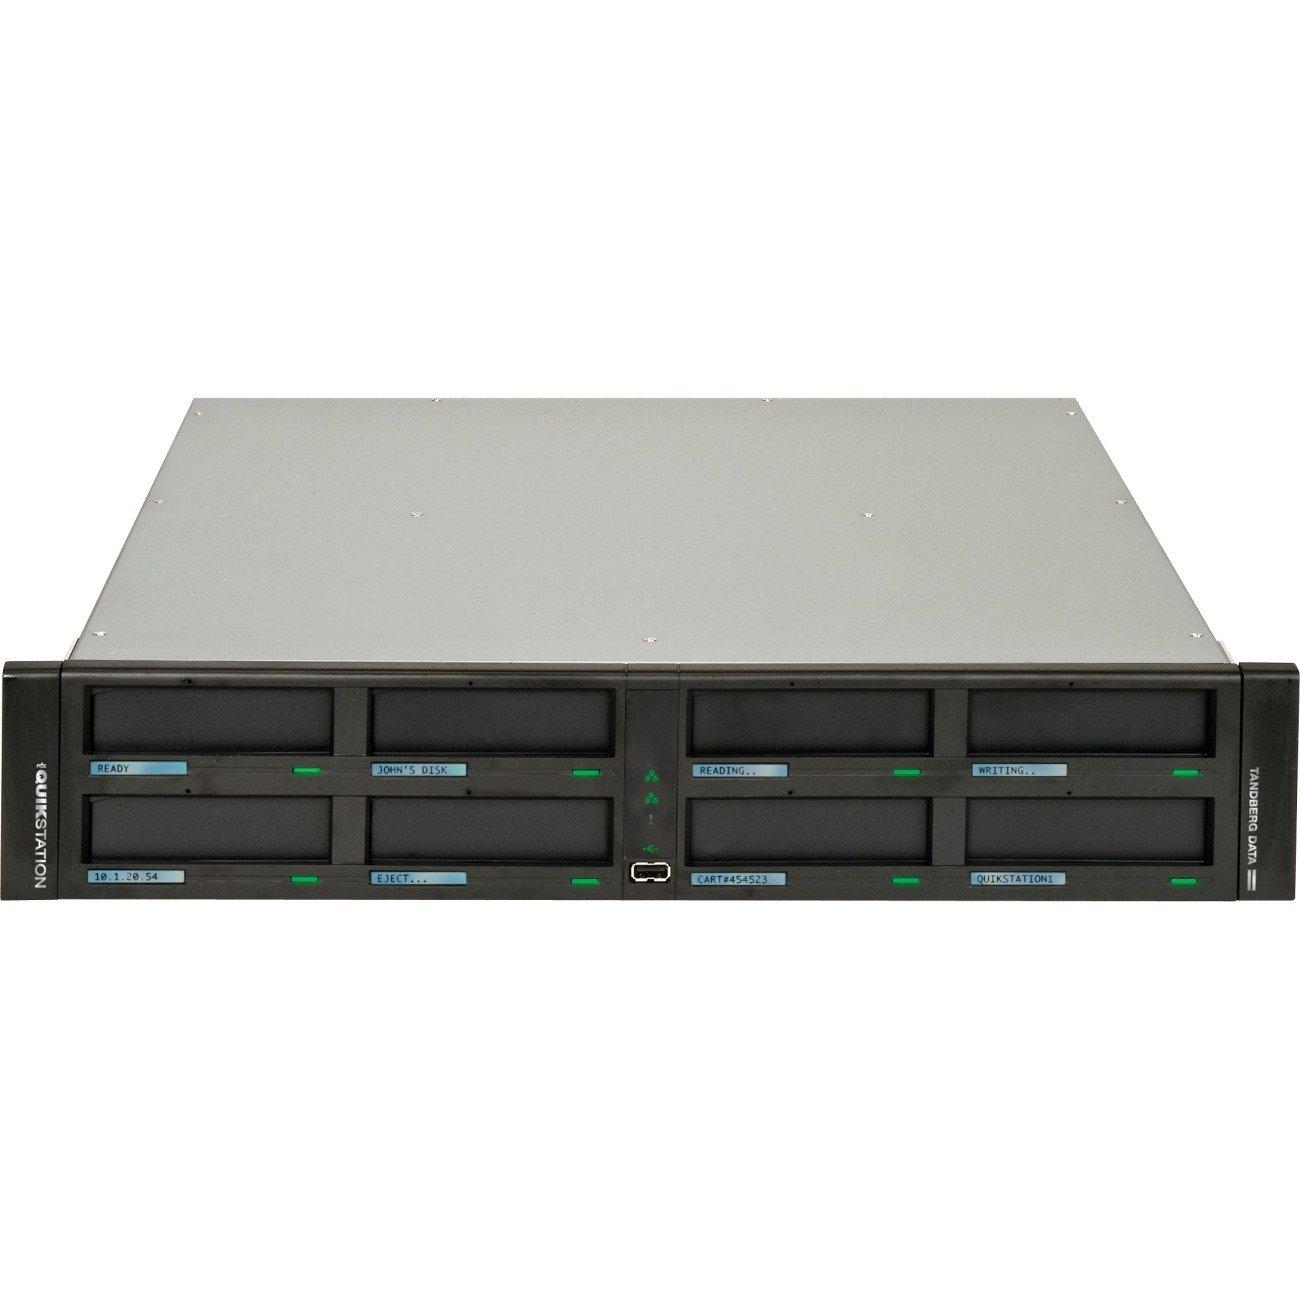 Tandberg Data QuikStation 8900-RDX 8 x Total Bays NAS Storage System - 2U - Rack-mountable